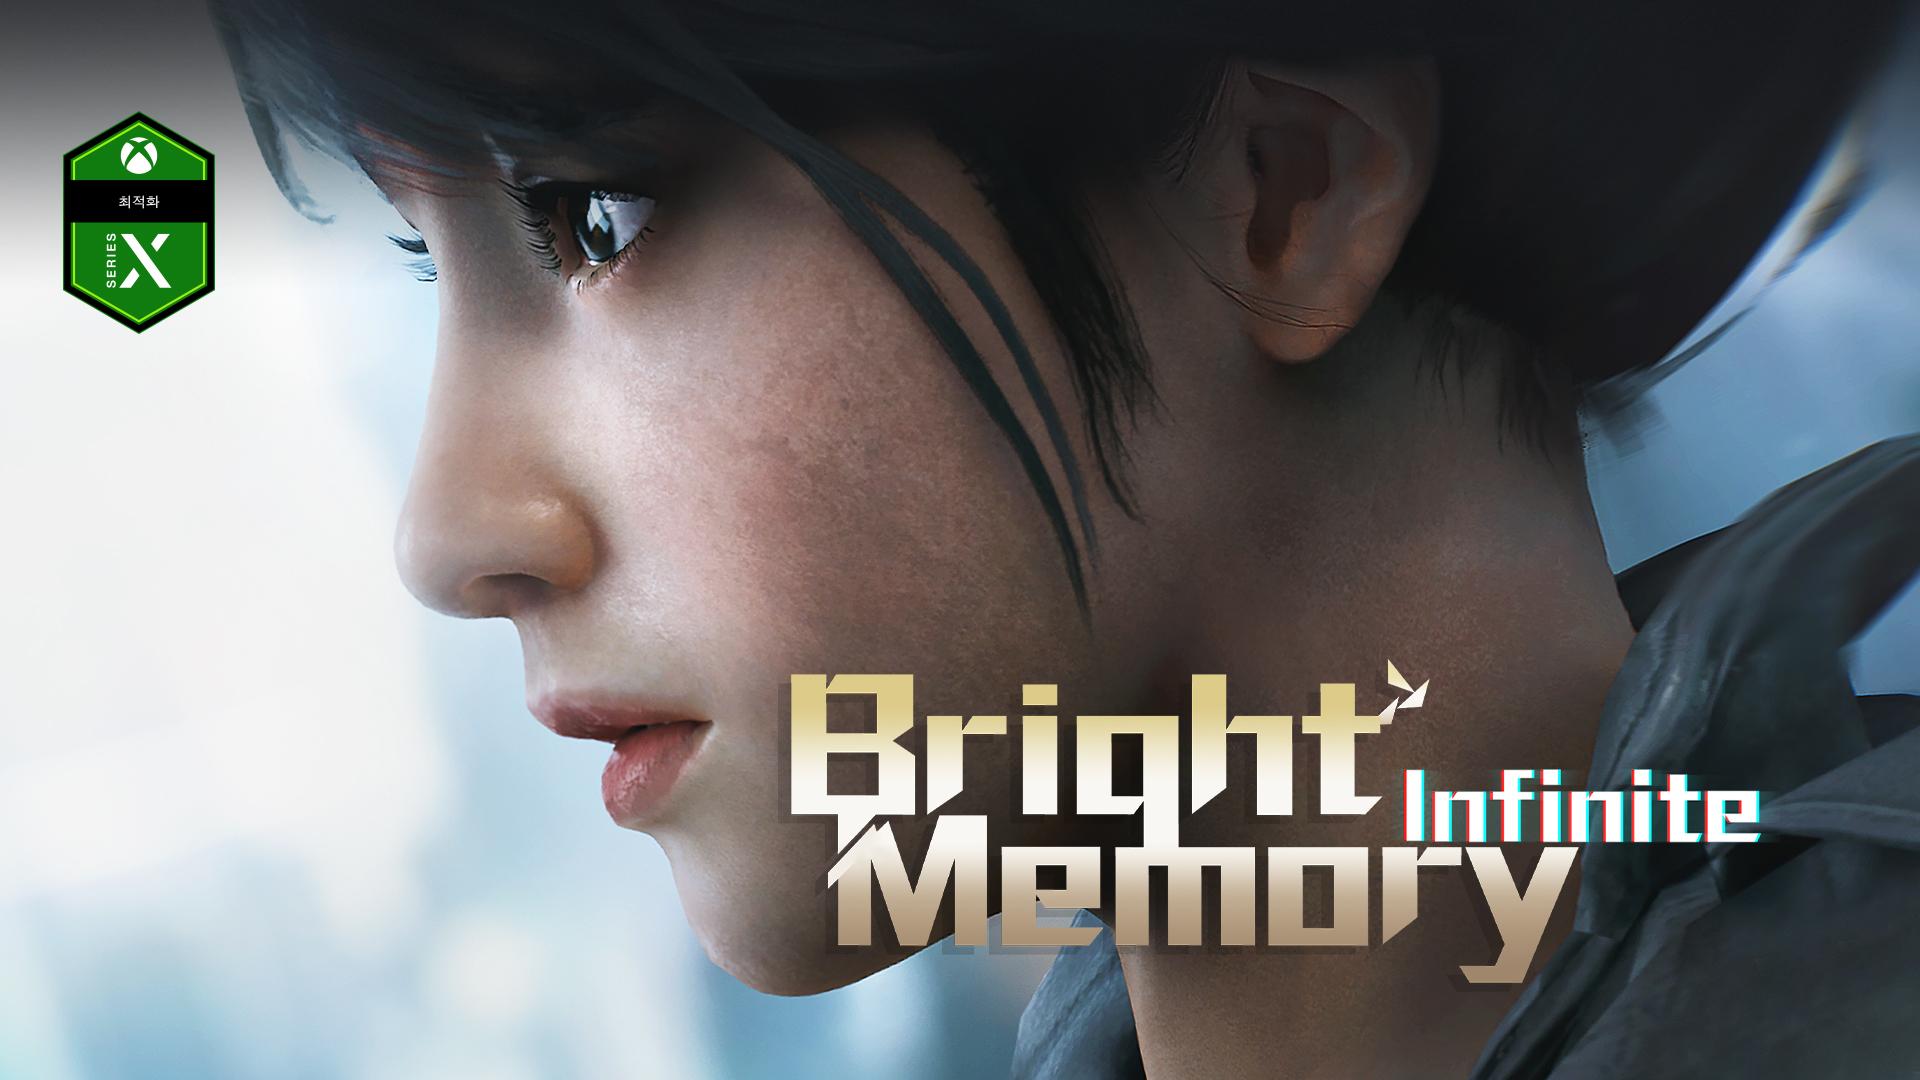 Bright Memory Infinite, Series X에 최적화, 젊은 여성이 먼 곳을 자세히 봅니다.